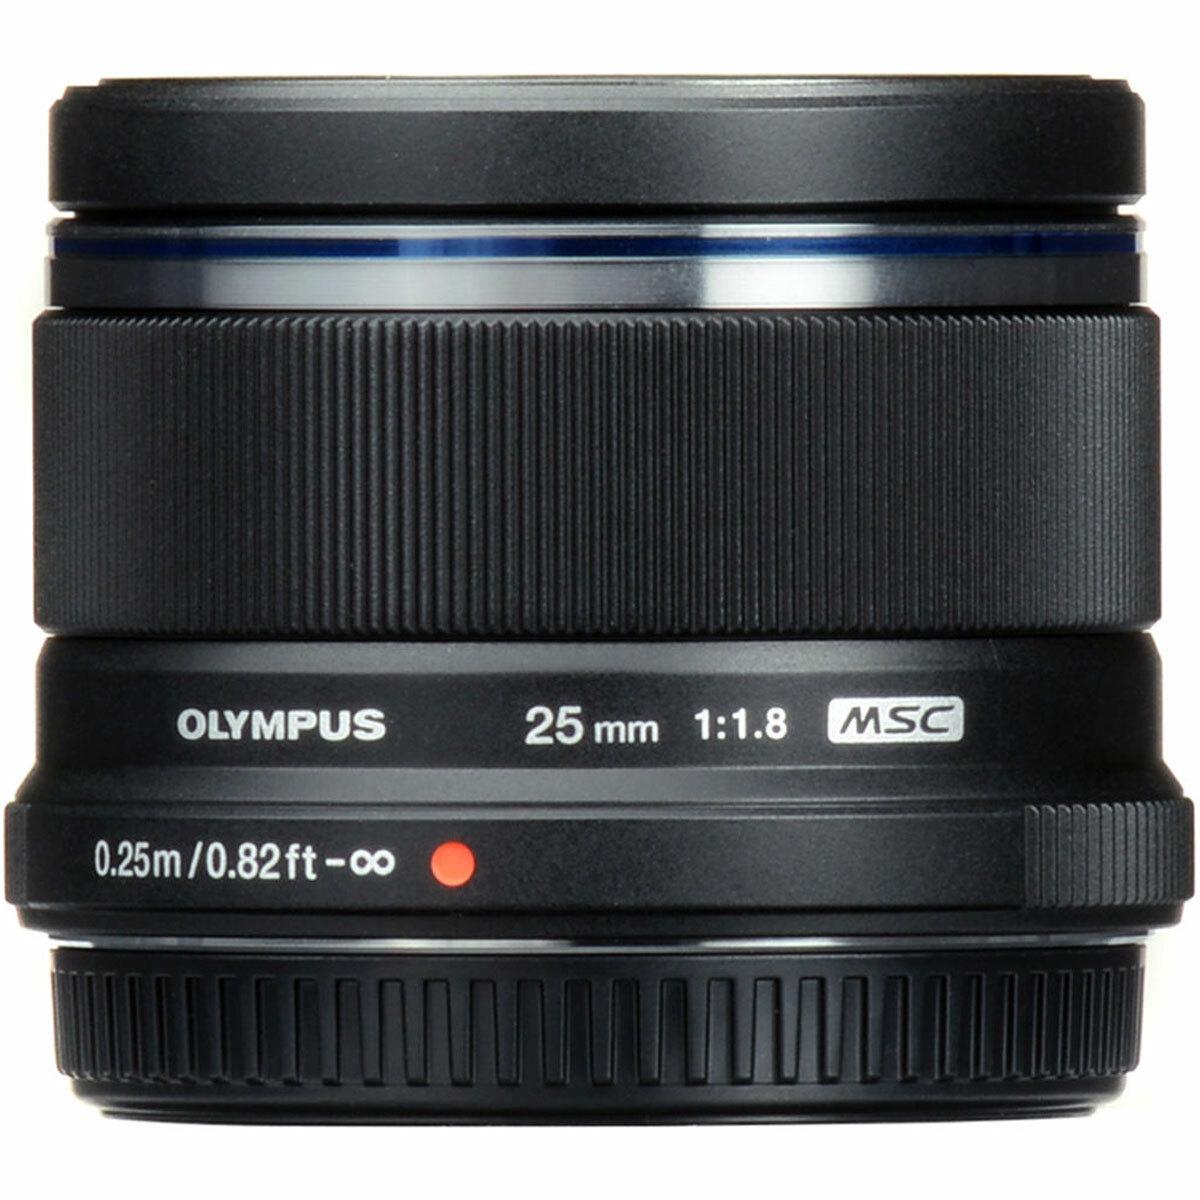 Olympus M.Zuiko Digital 25mm f1.8 Lens 00050